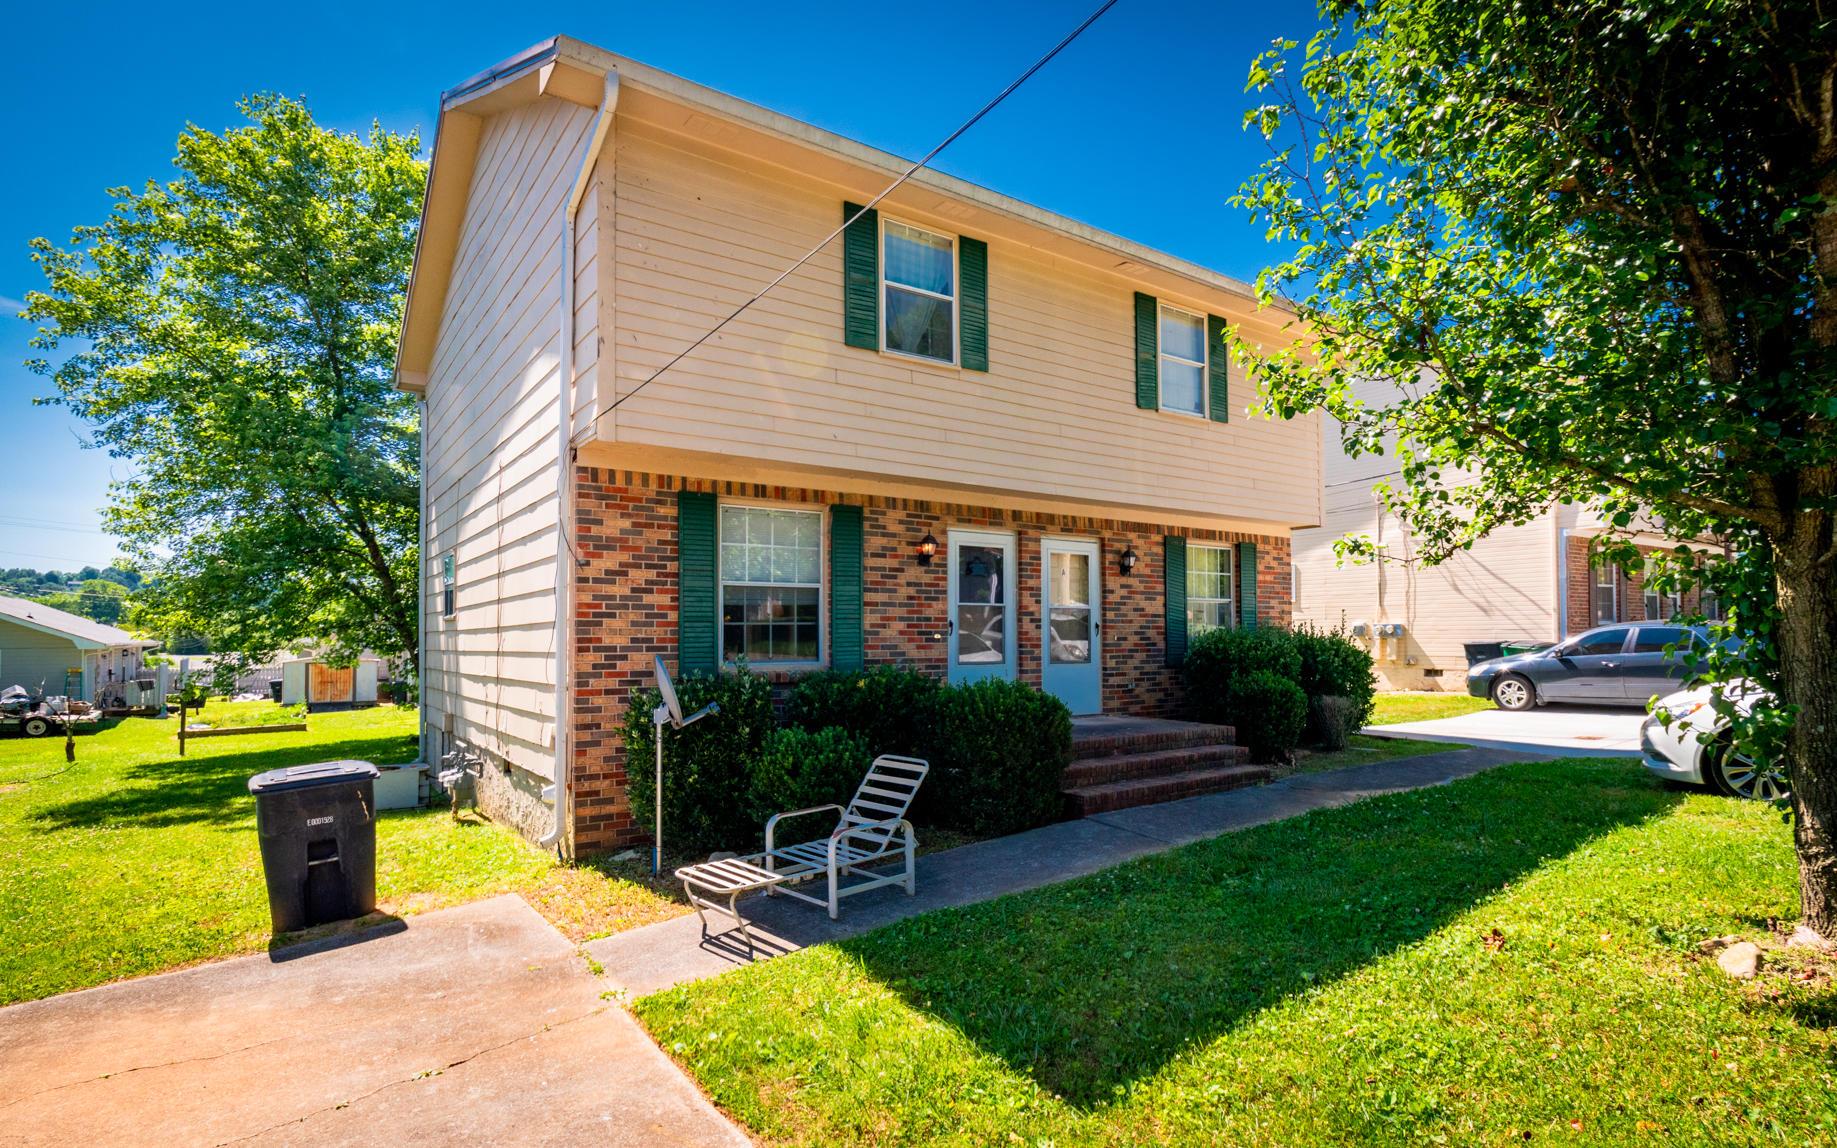 1286 Wright St, Chattanooga, TN 37412